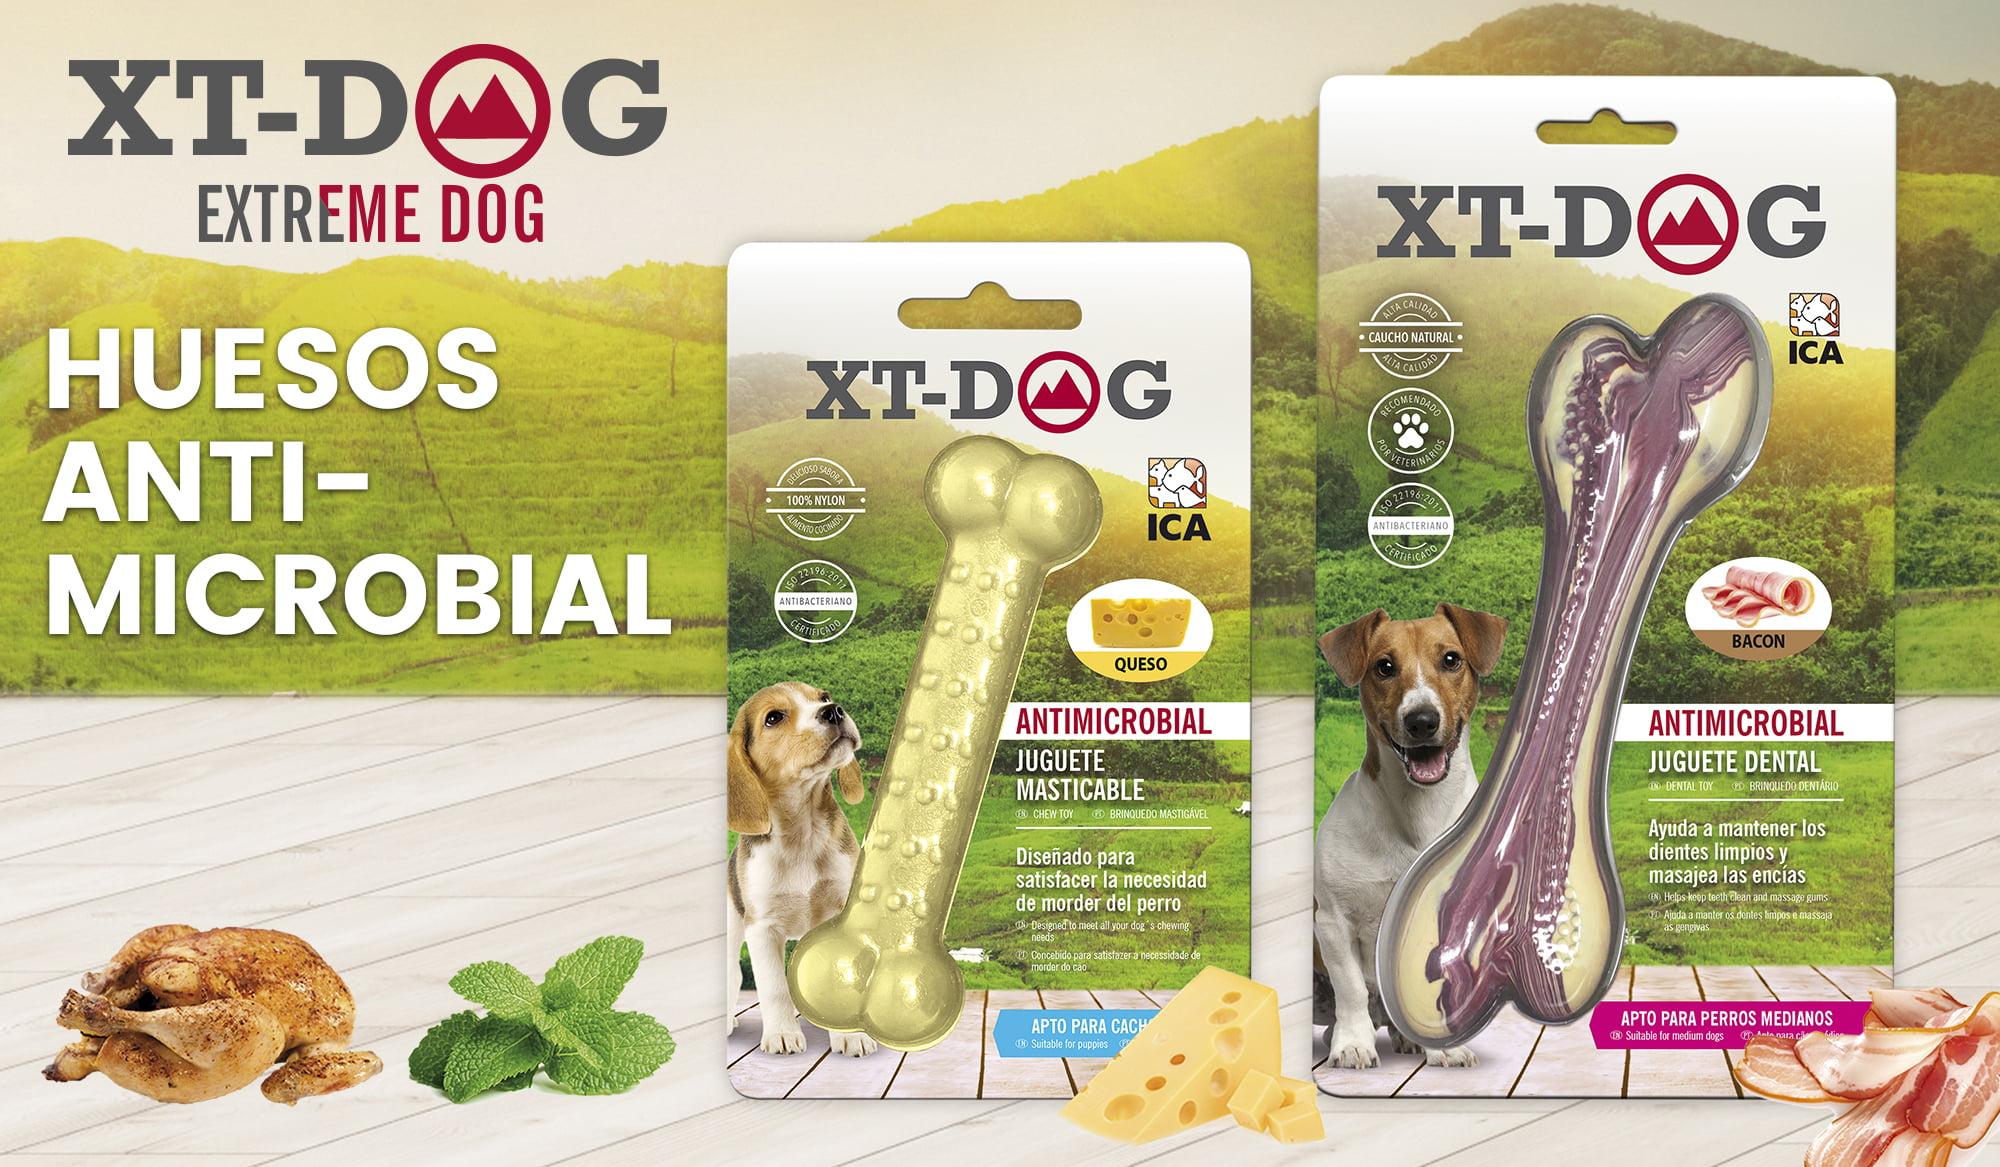 Juguetes dentales antimicrobianos XT-Dog